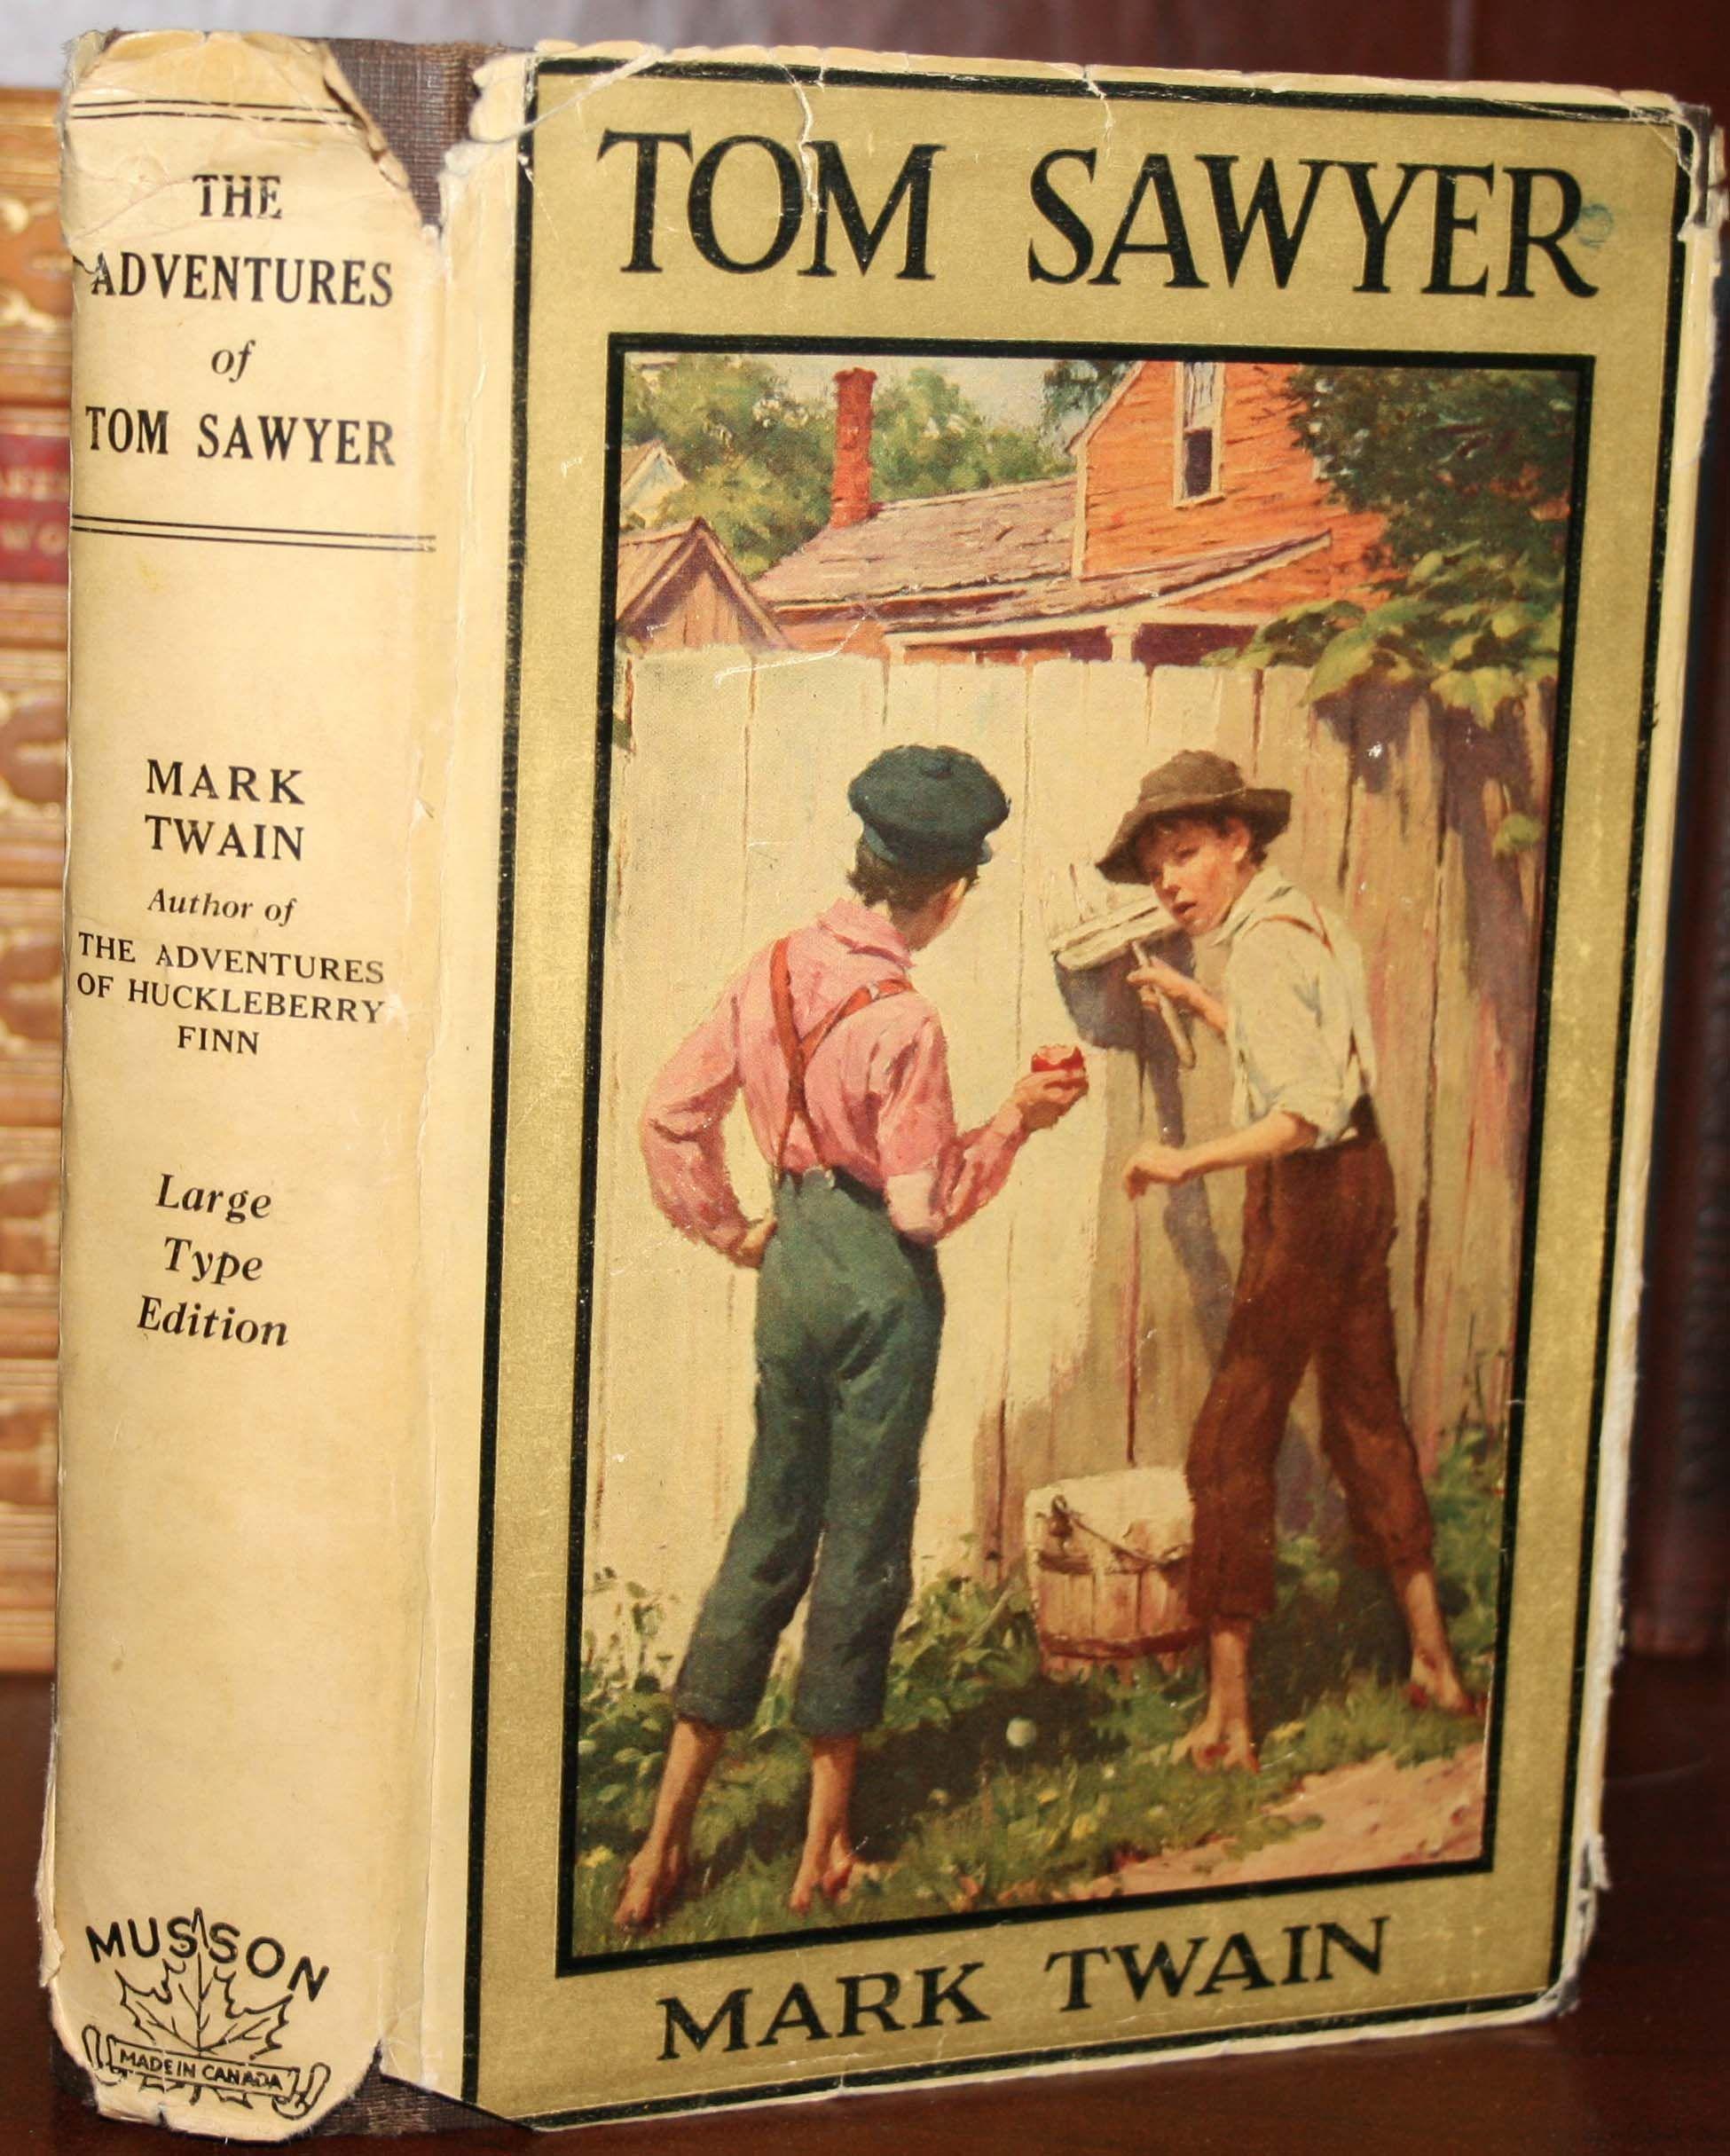 картинки обложки книги том сойера пучок, или шишка